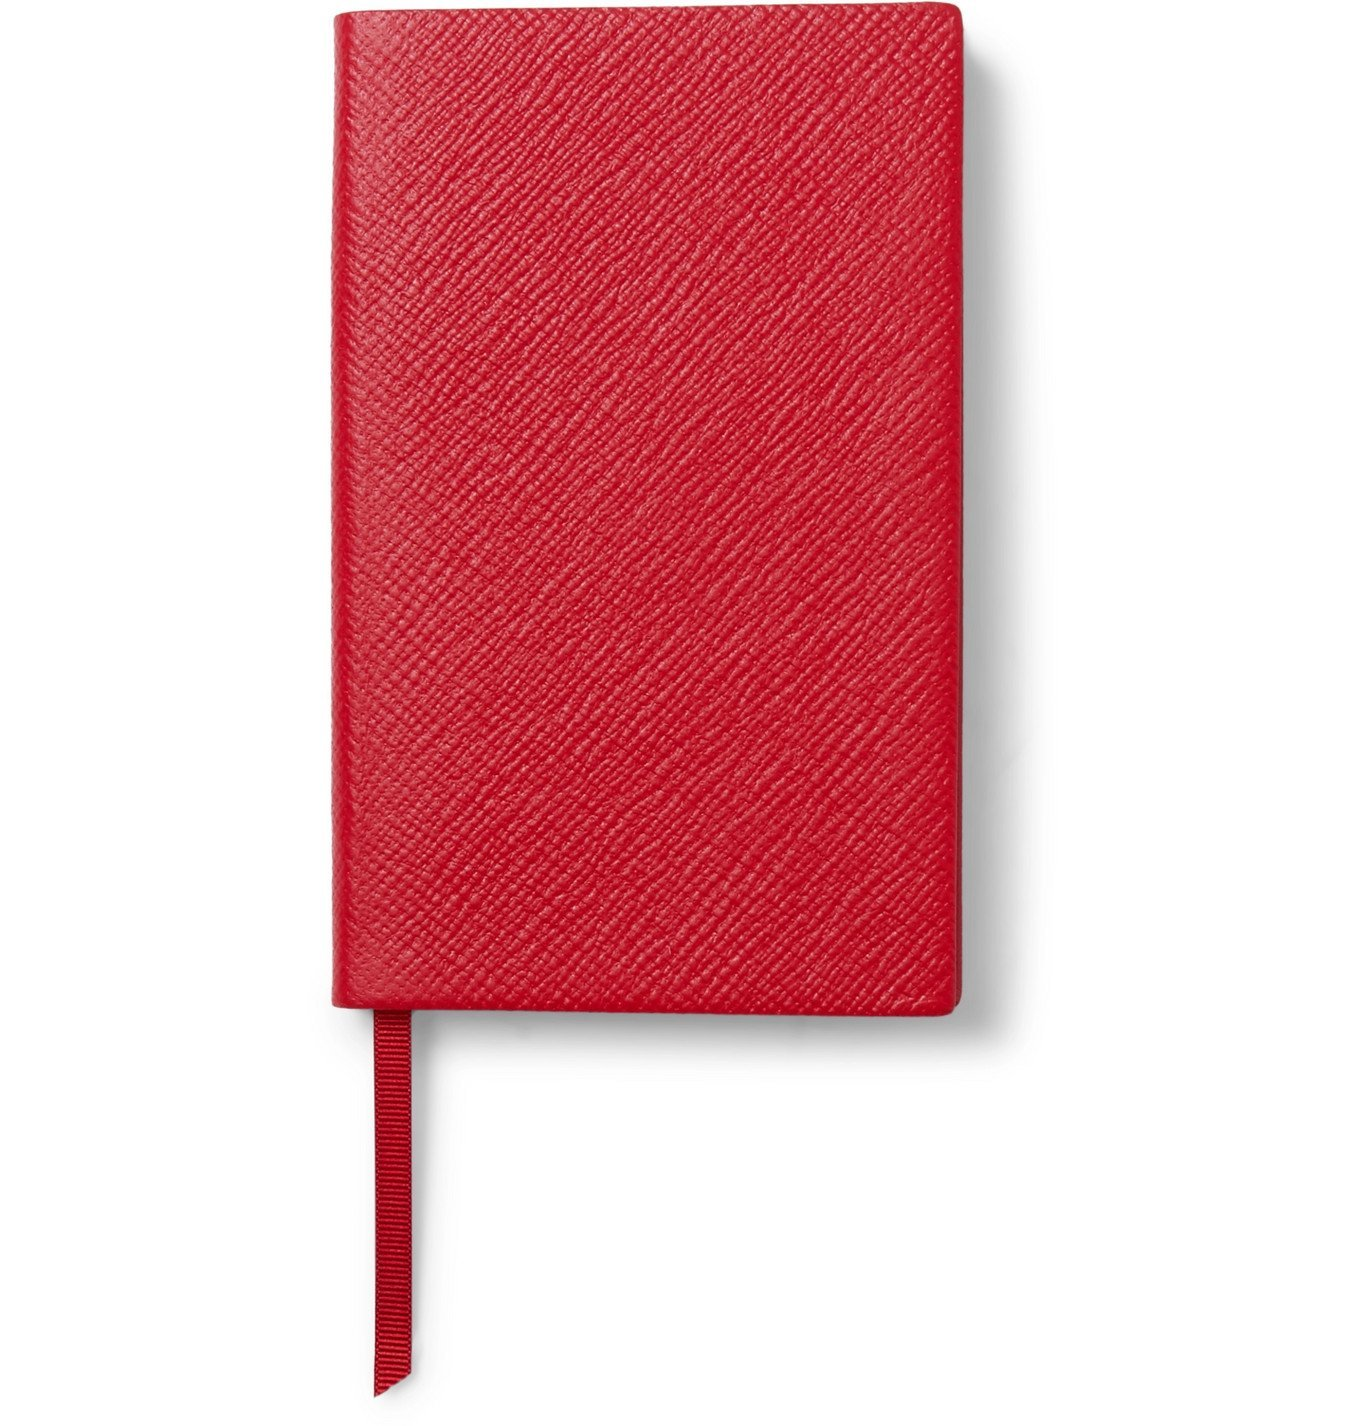 Smythson - Panama Cross-Grain Leather Notebook - Red